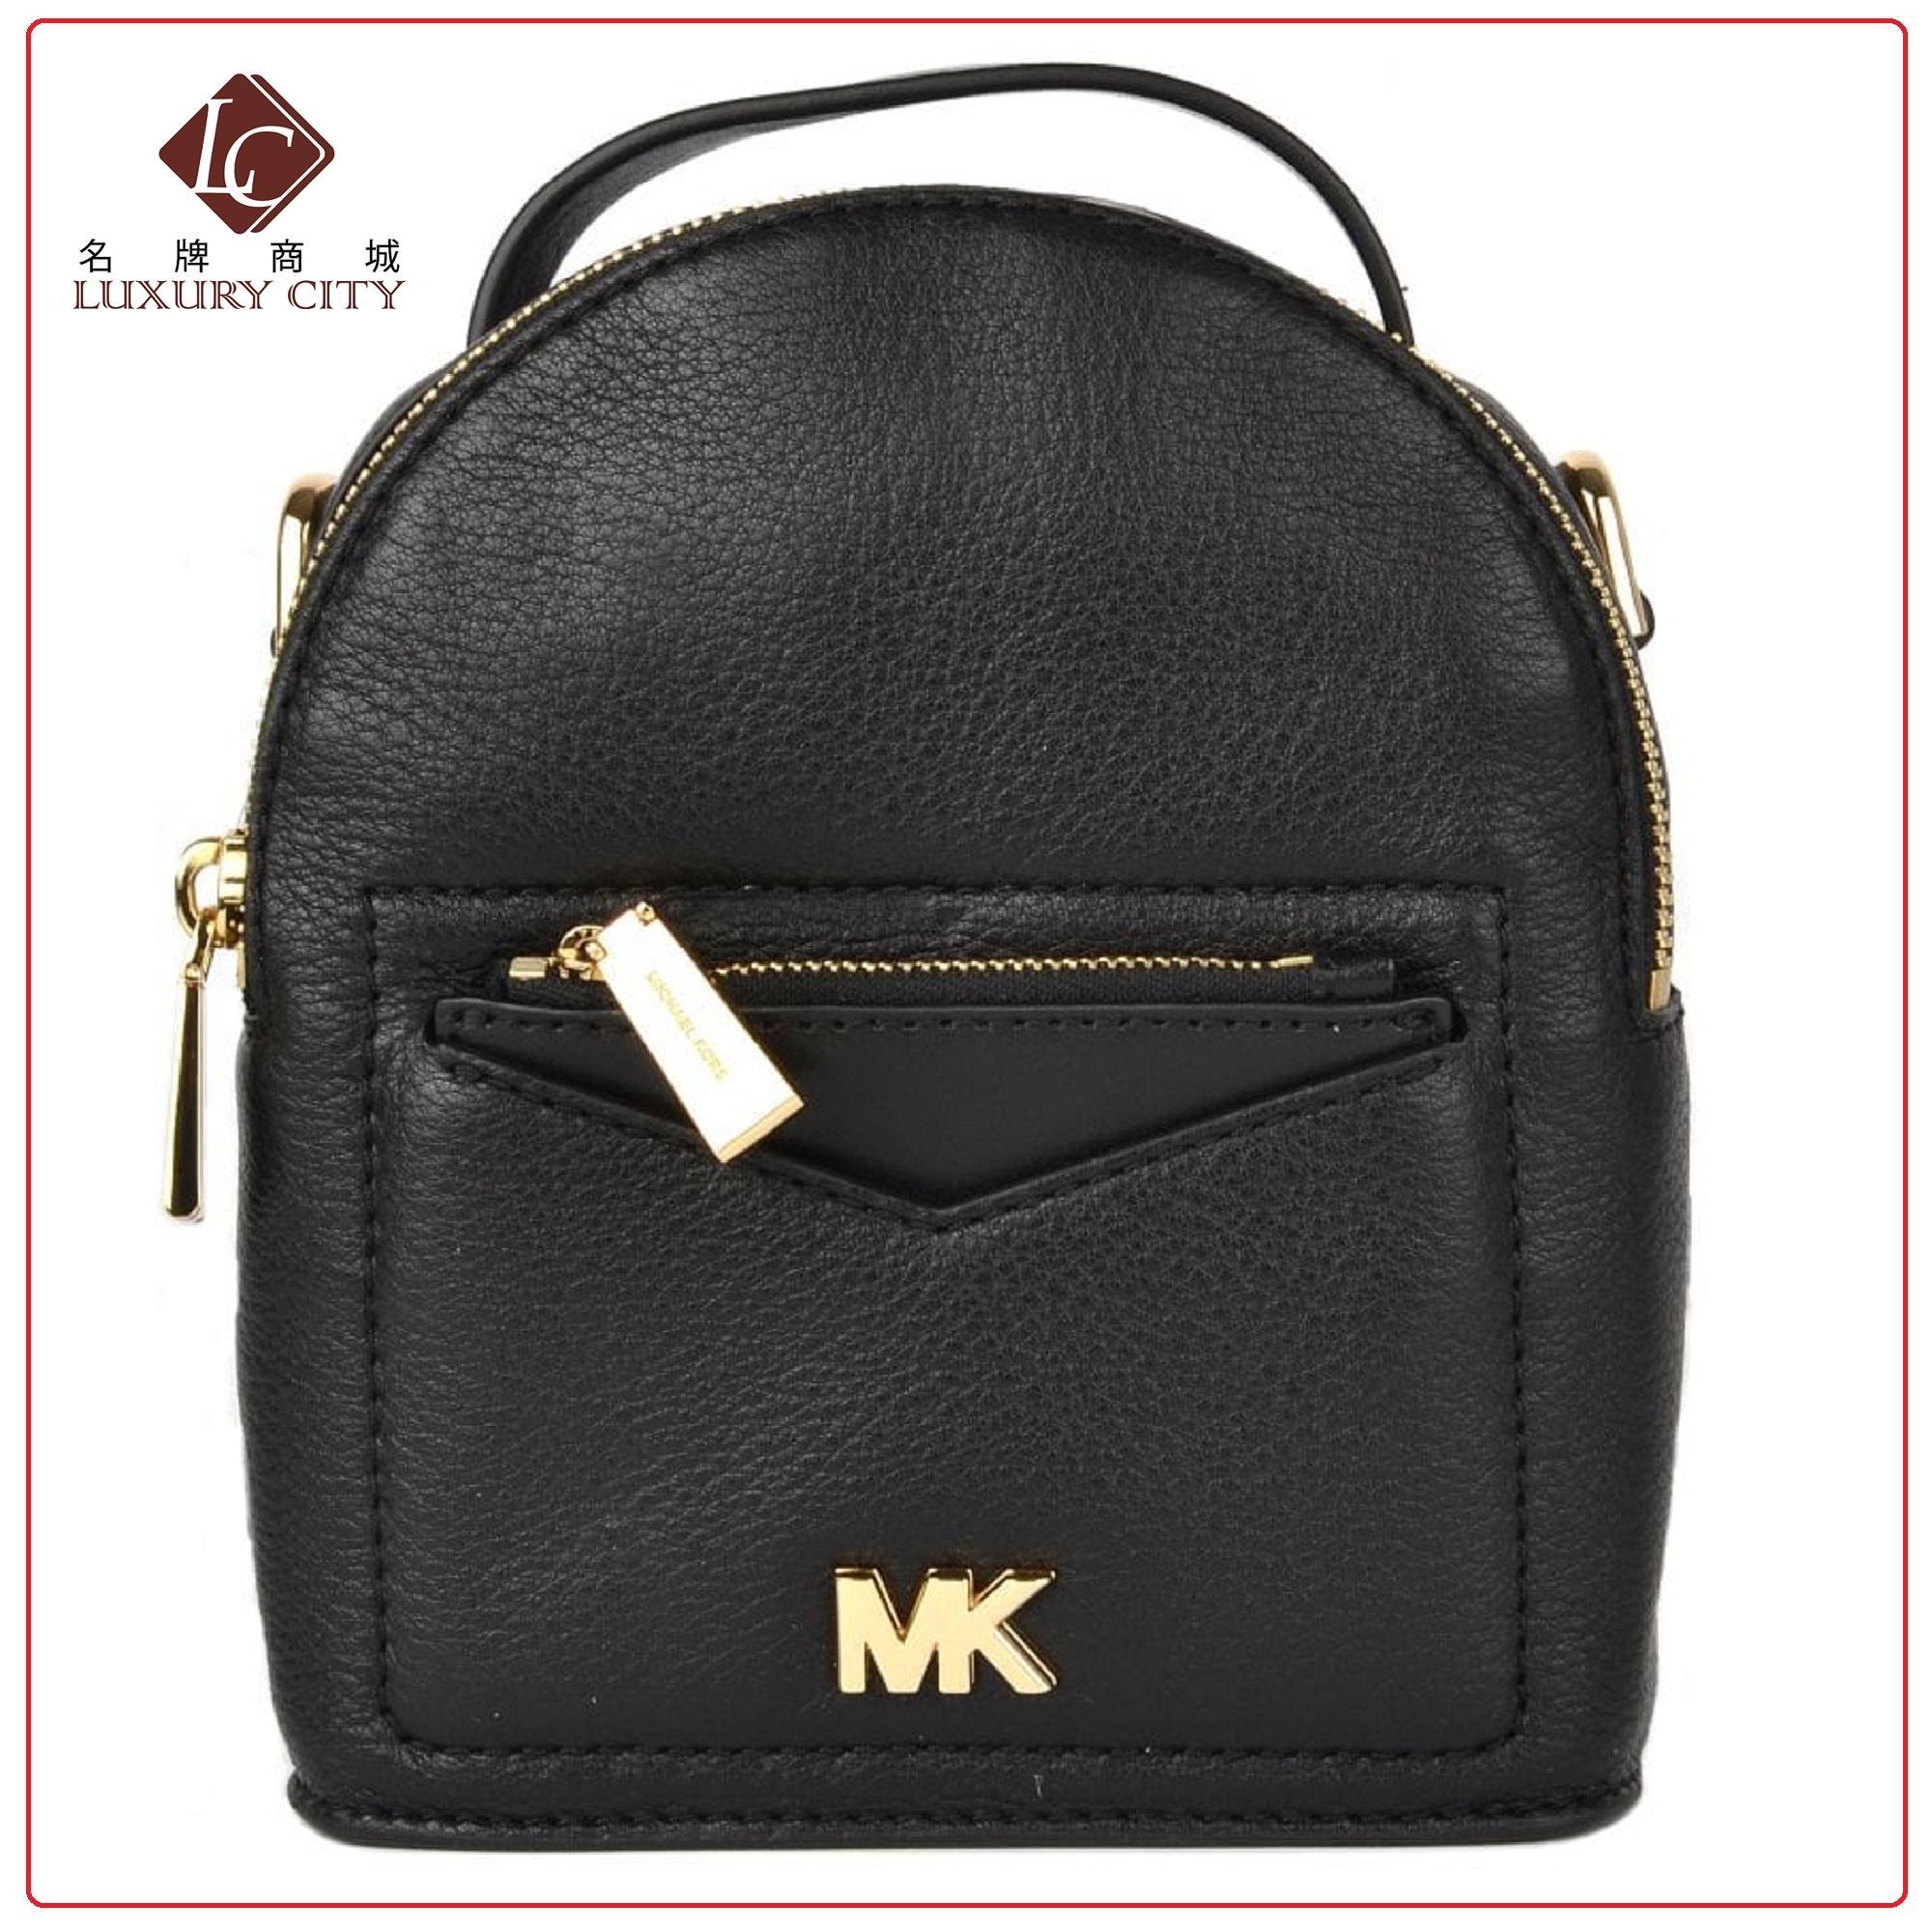 837436d01b83 Michael Kors Jessa Extra Small Black Convertible Backpack MK-30T8GEVB0L  (Black)